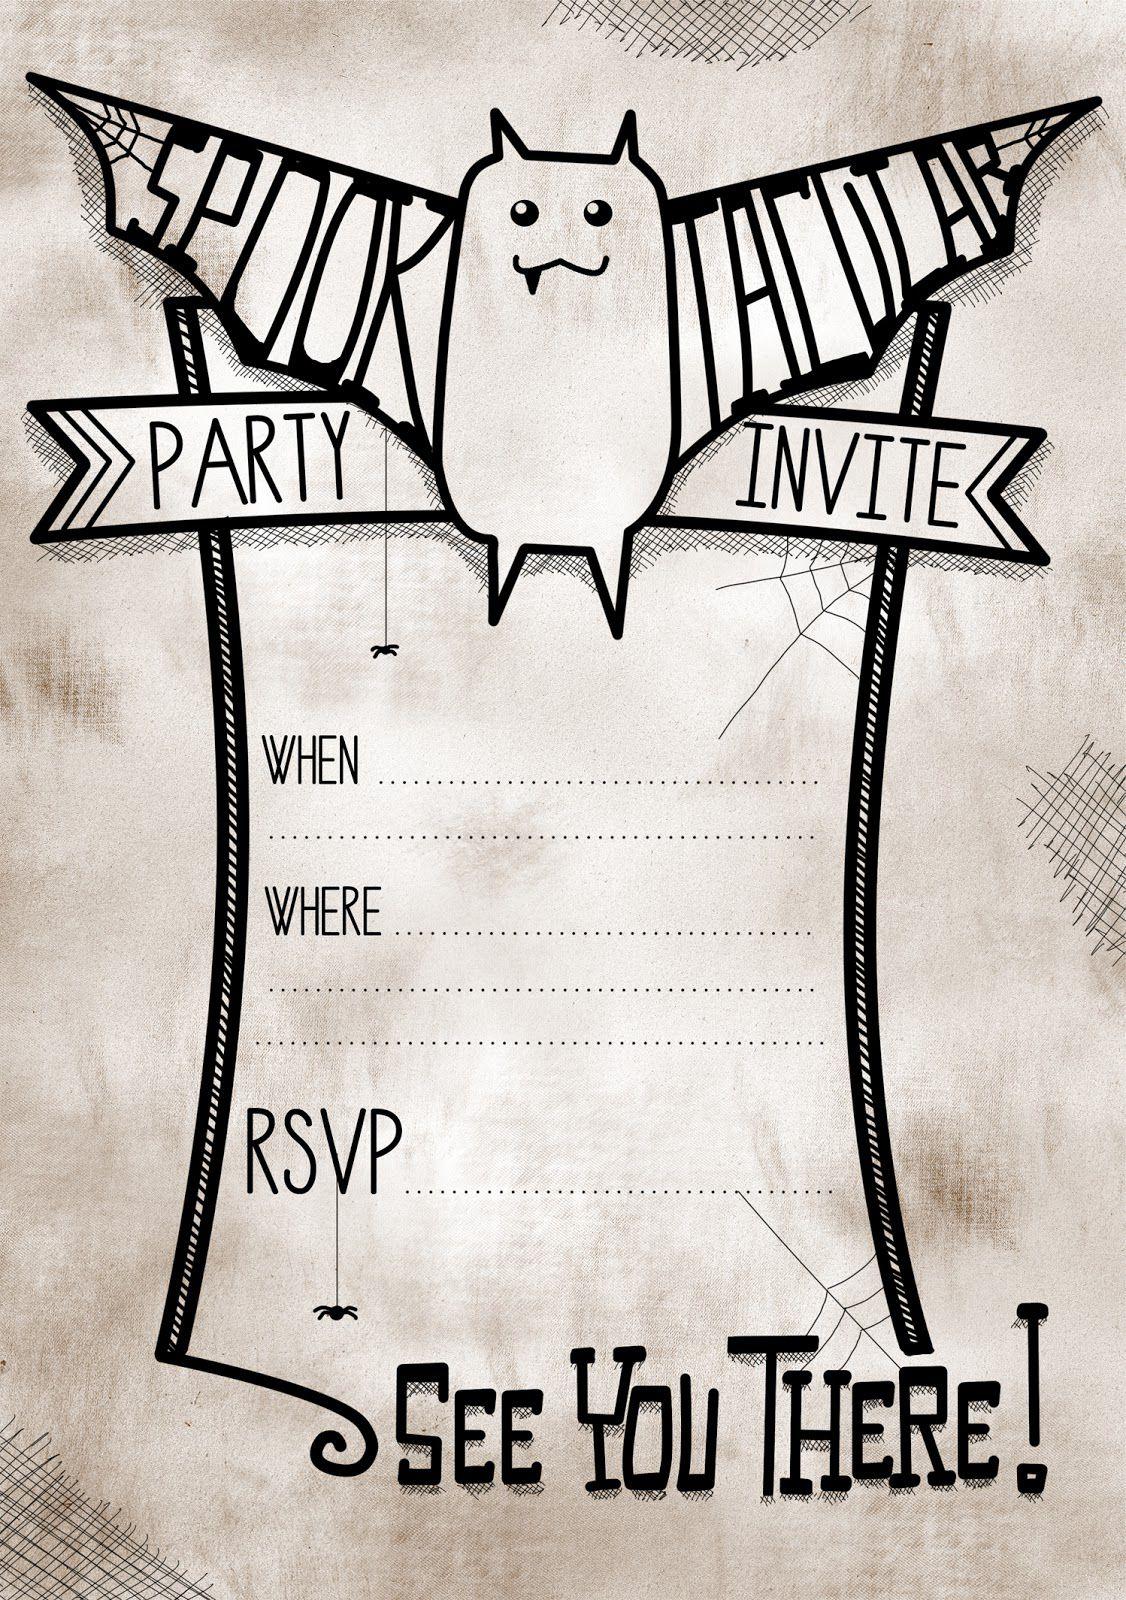 009 Breathtaking Free Halloween Invitation Template Sample  Templates Microsoft Word Wedding Printable PartyFull